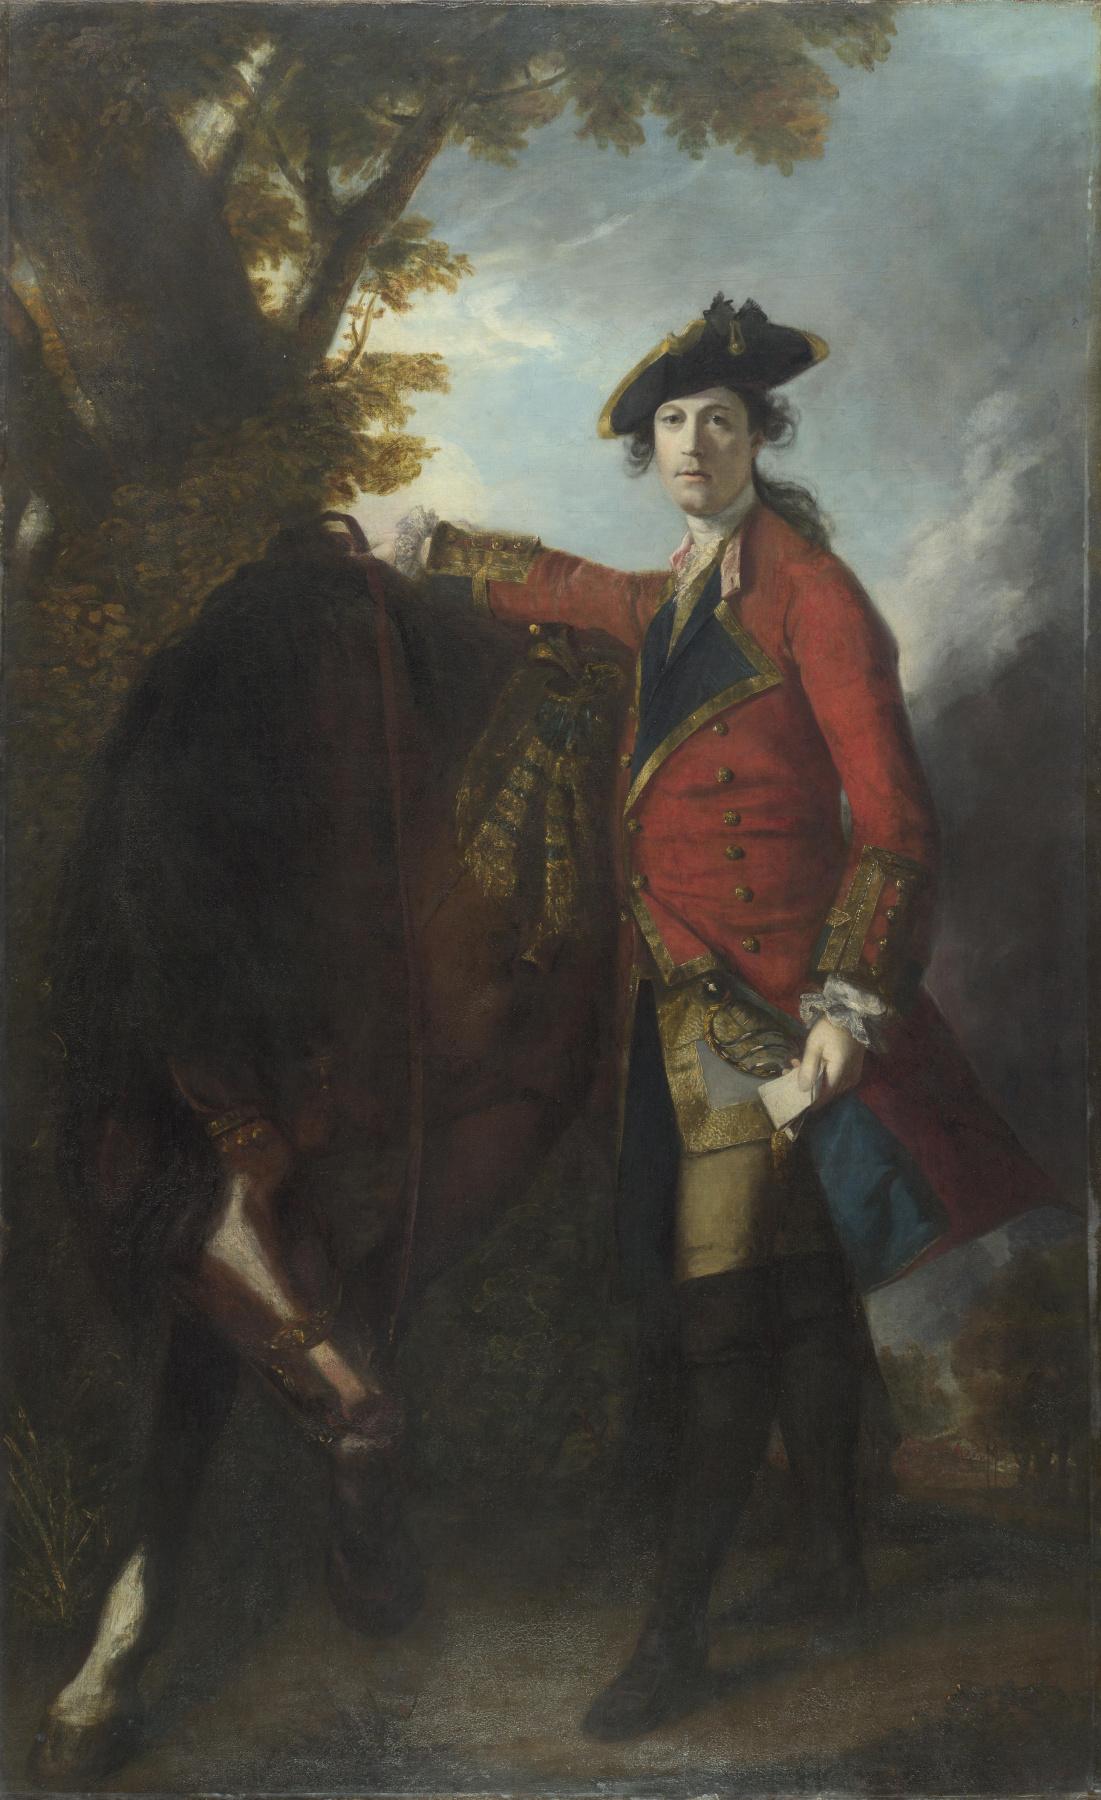 Joshua Reynolds. Captain Robert Orme